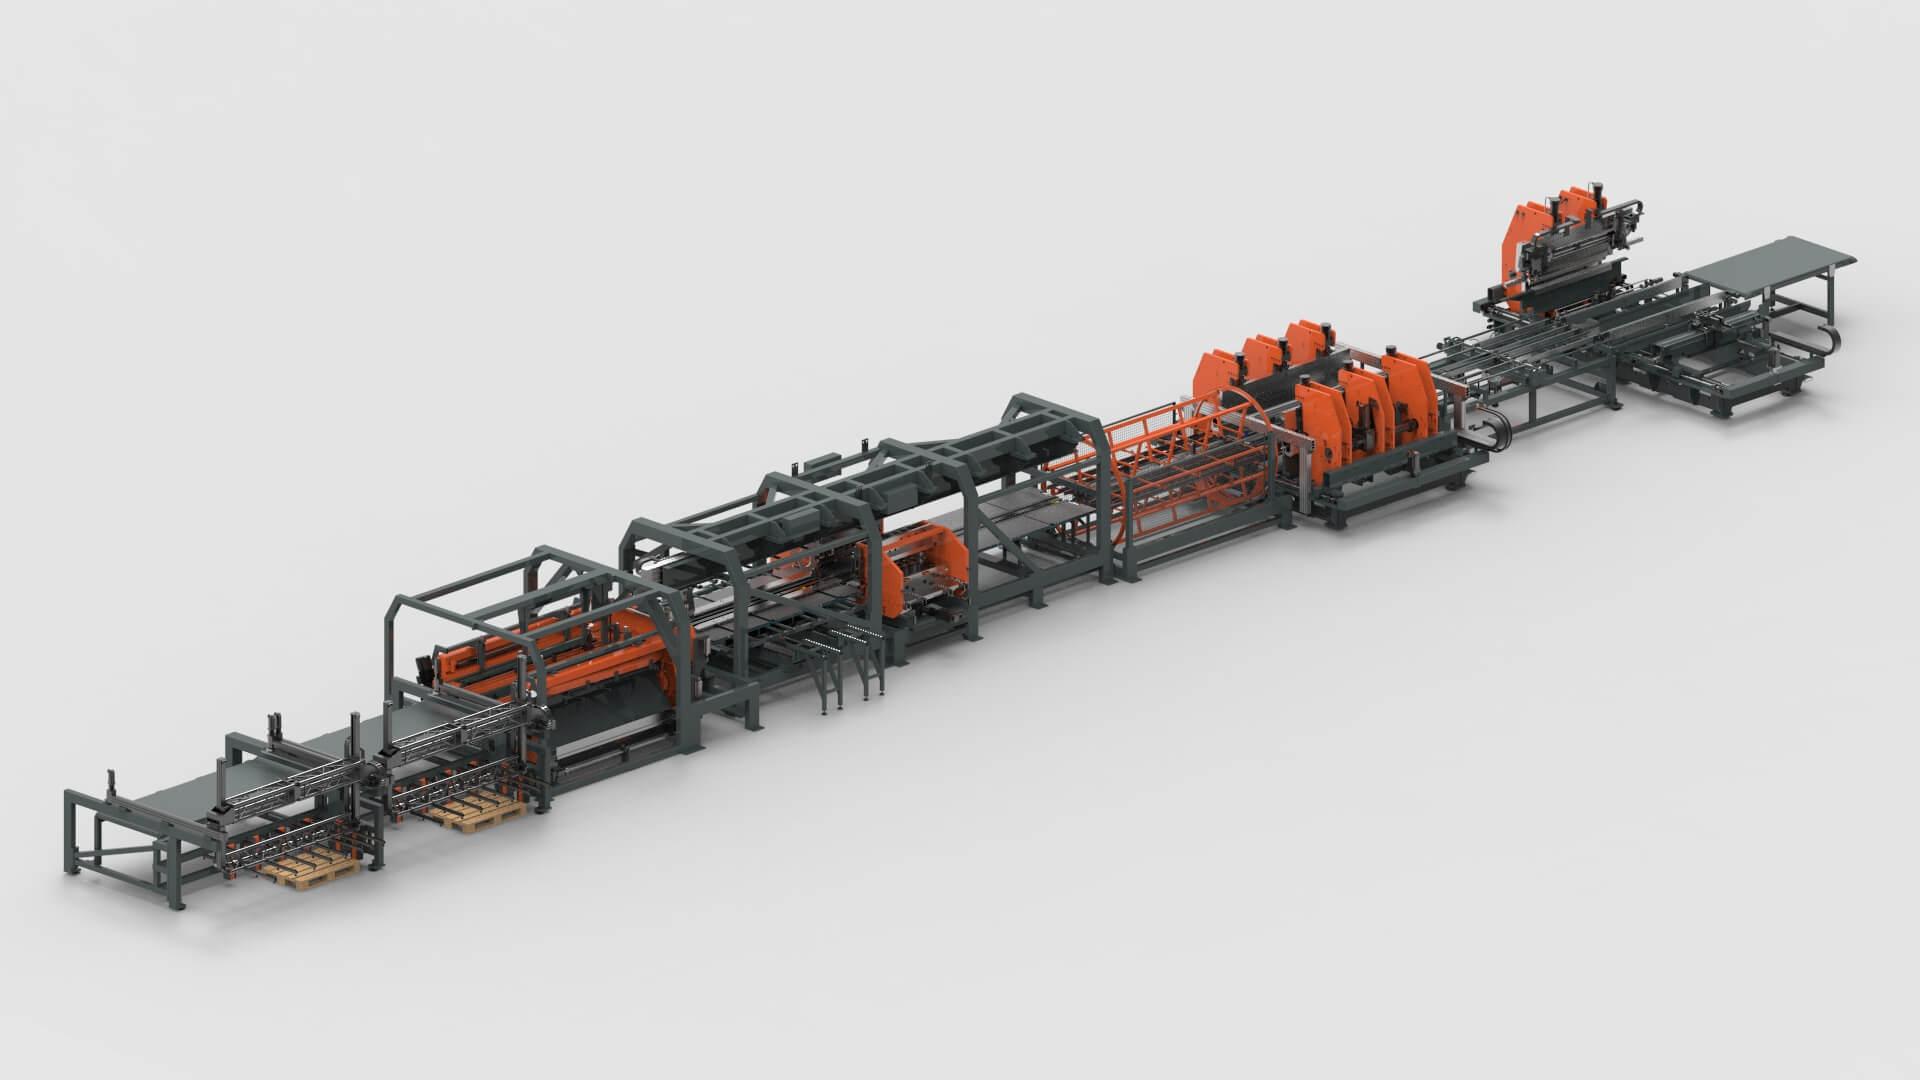 wemo-steel-doors-sheet-metal-cutting-sheet-punching-bending-production-line.jpg